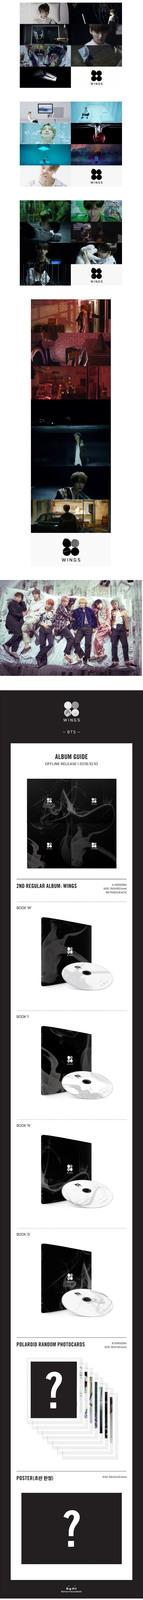 BTS-[WINGS] 2nd Album Random Ver. CD+POSTER+96p Photo Book+1p Card K-POP Sealed